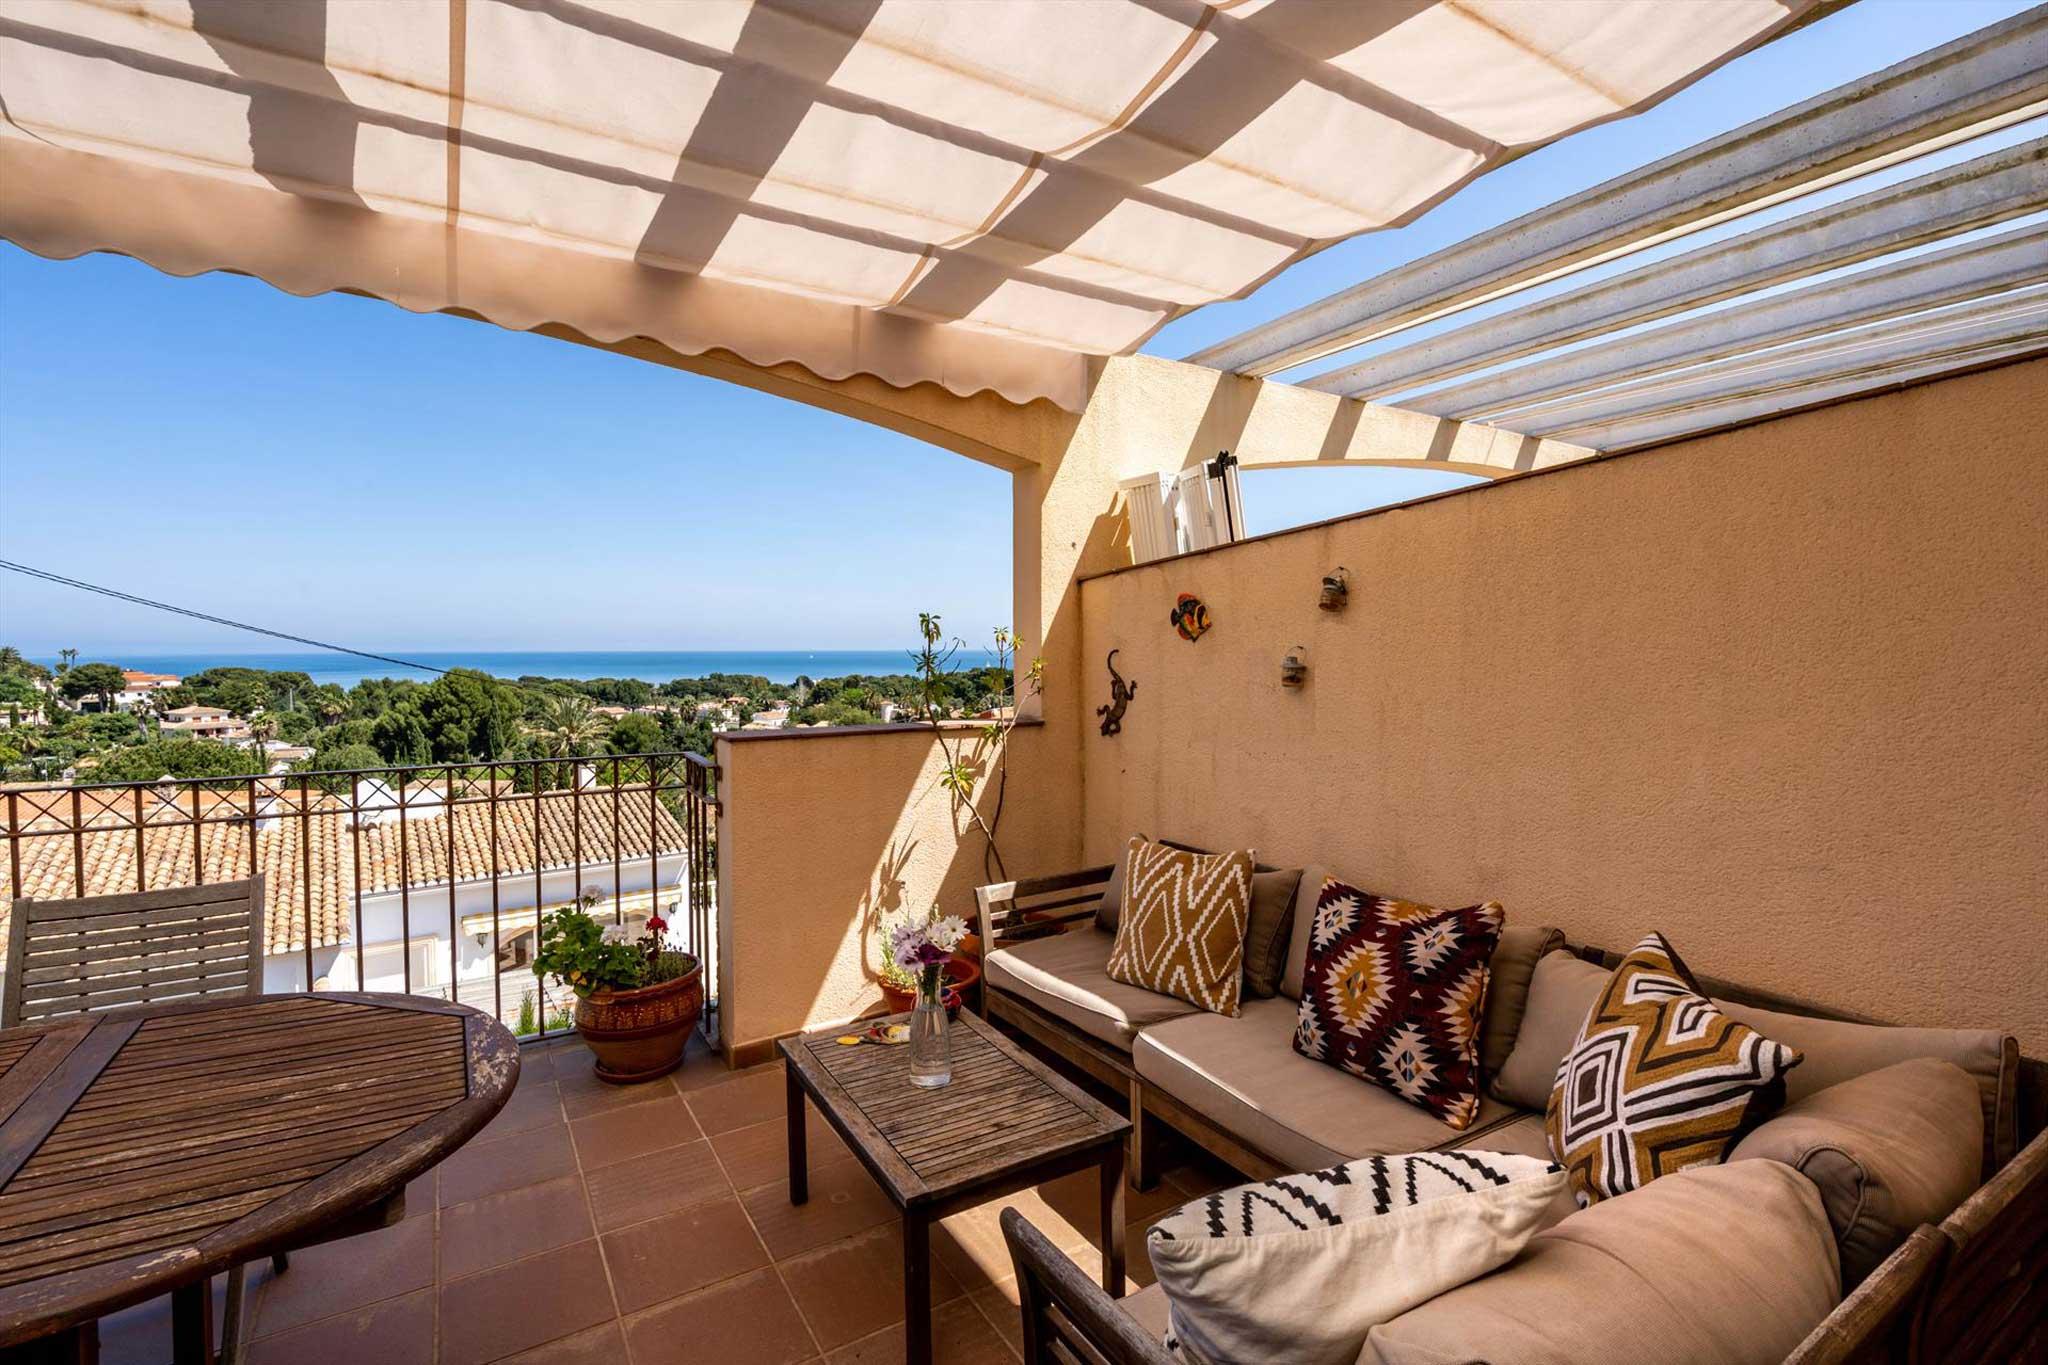 Casa con vistas al mar Denia – Quality Rent a Villa